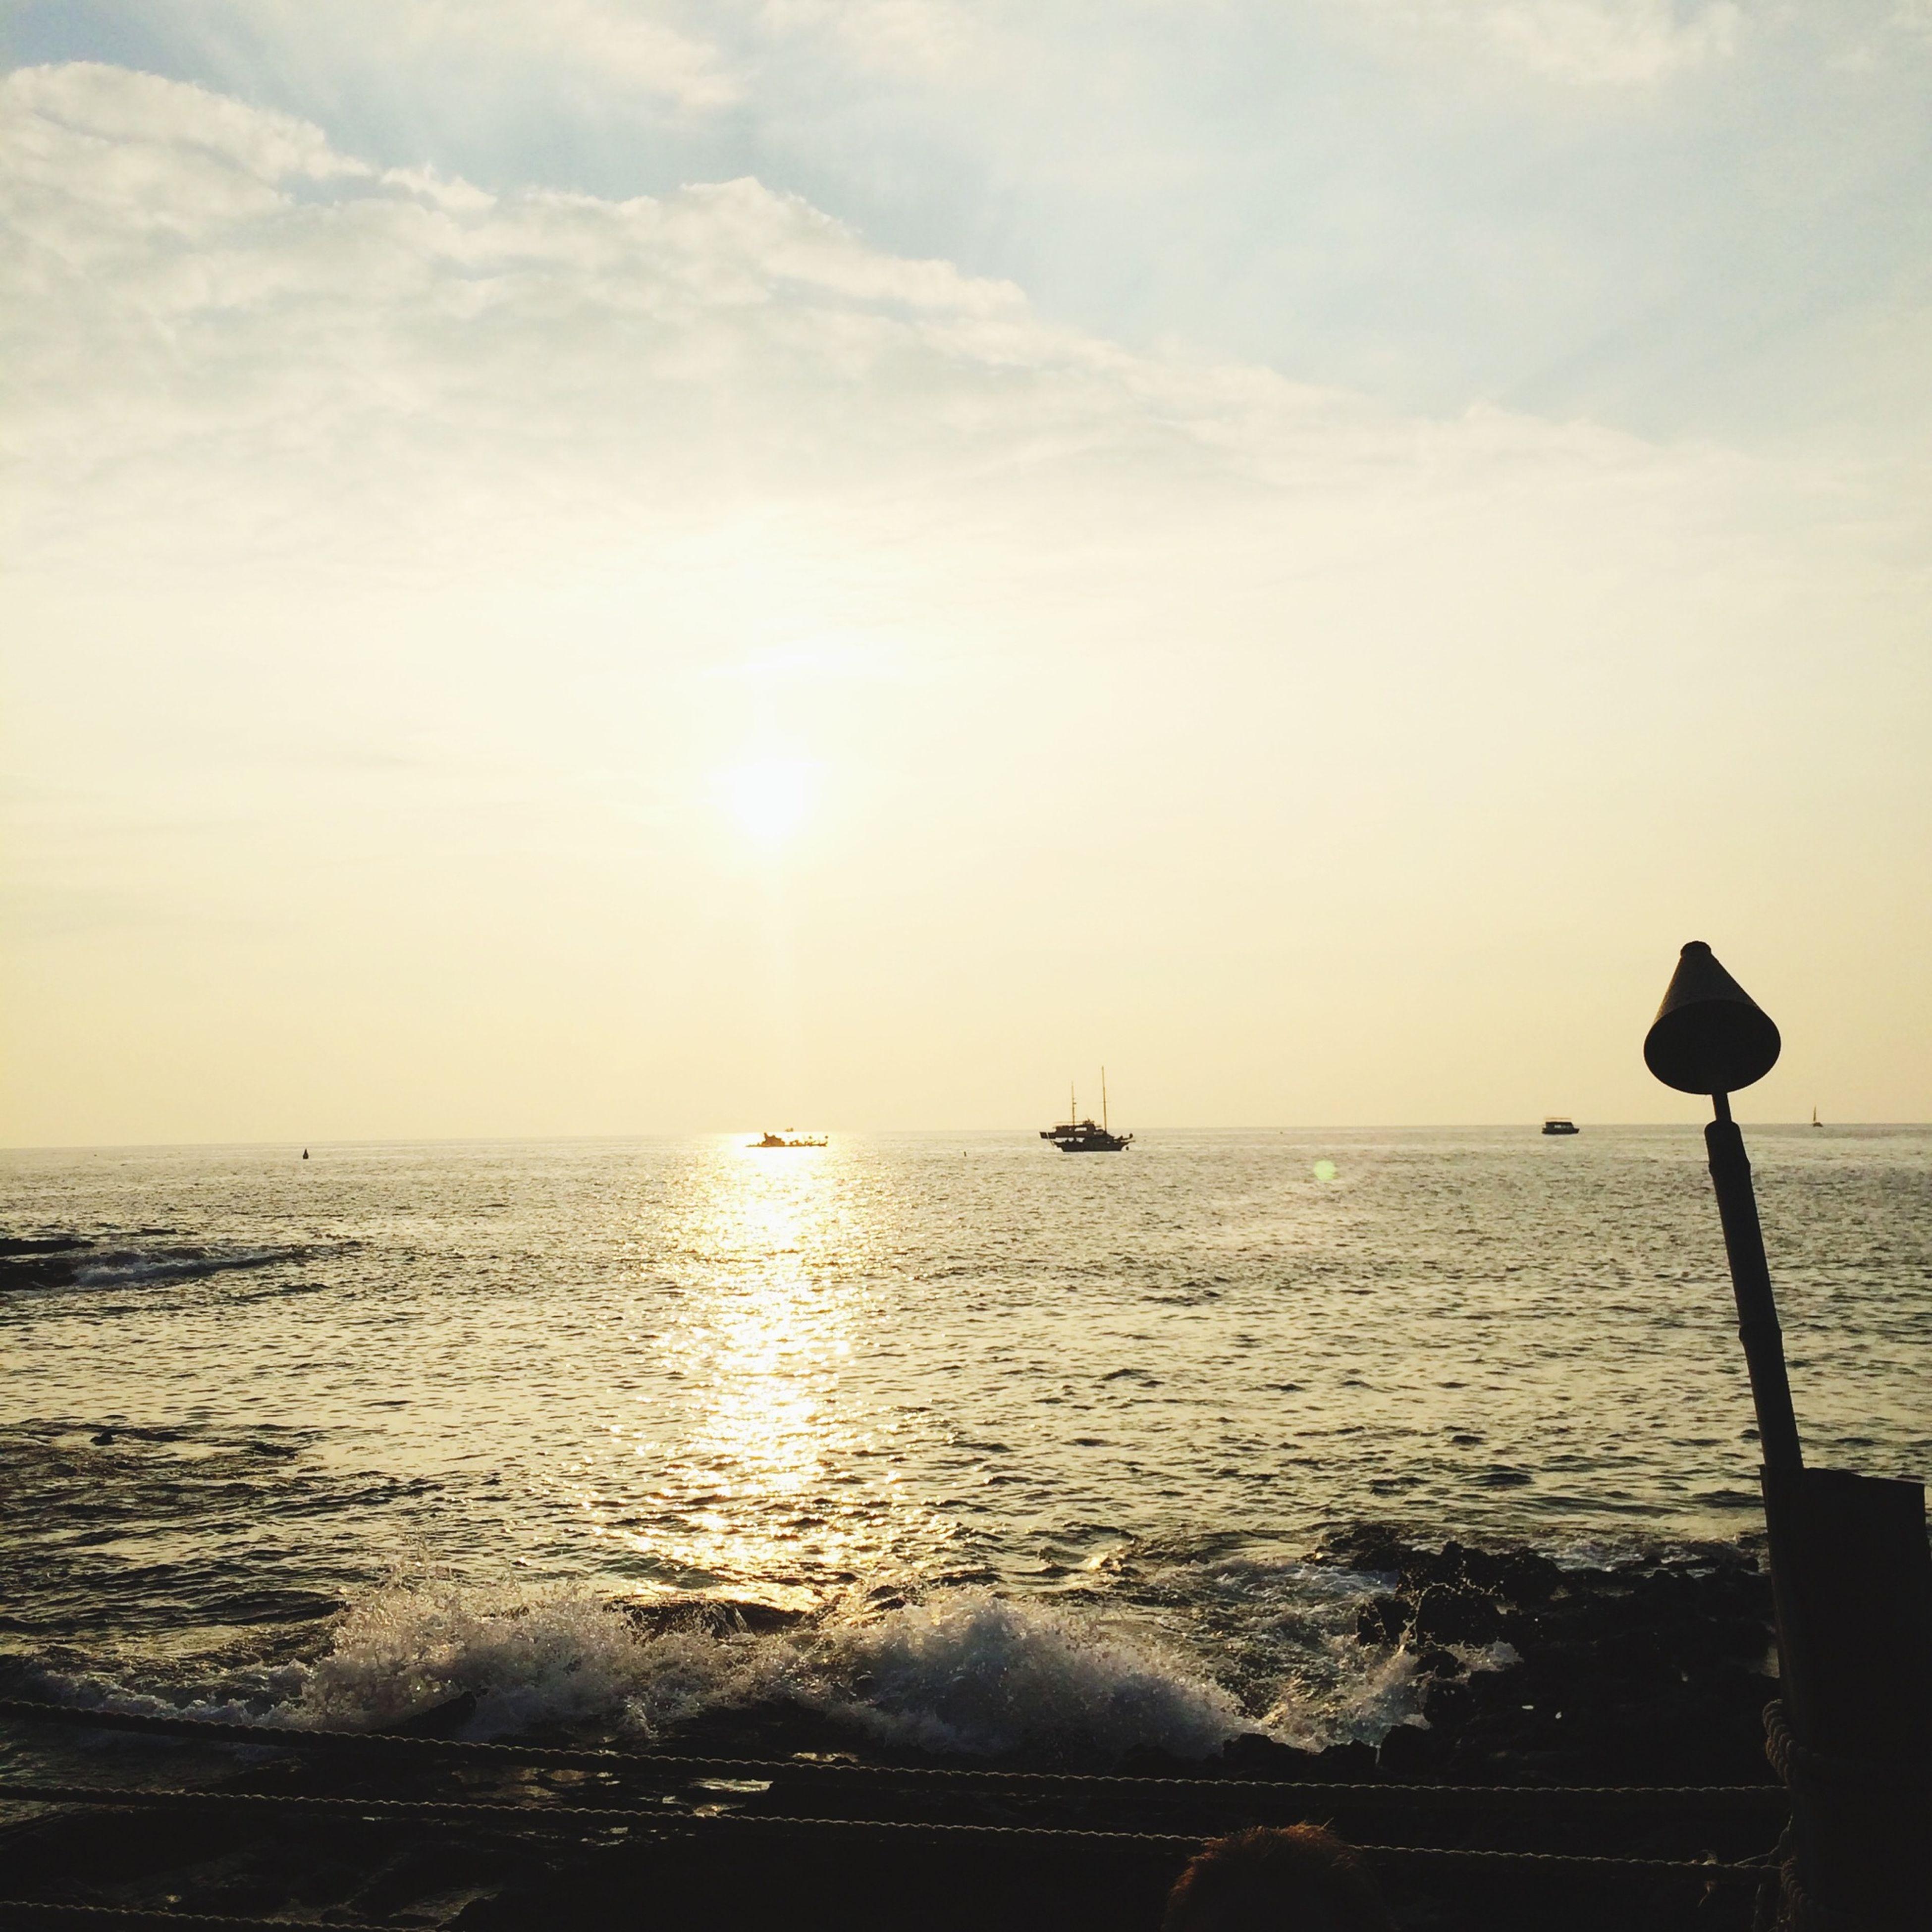 sea, water, horizon over water, sun, nautical vessel, sunset, transportation, scenics, tranquil scene, tranquility, sky, beauty in nature, boat, mode of transport, sunlight, nature, rippled, idyllic, reflection, sunbeam